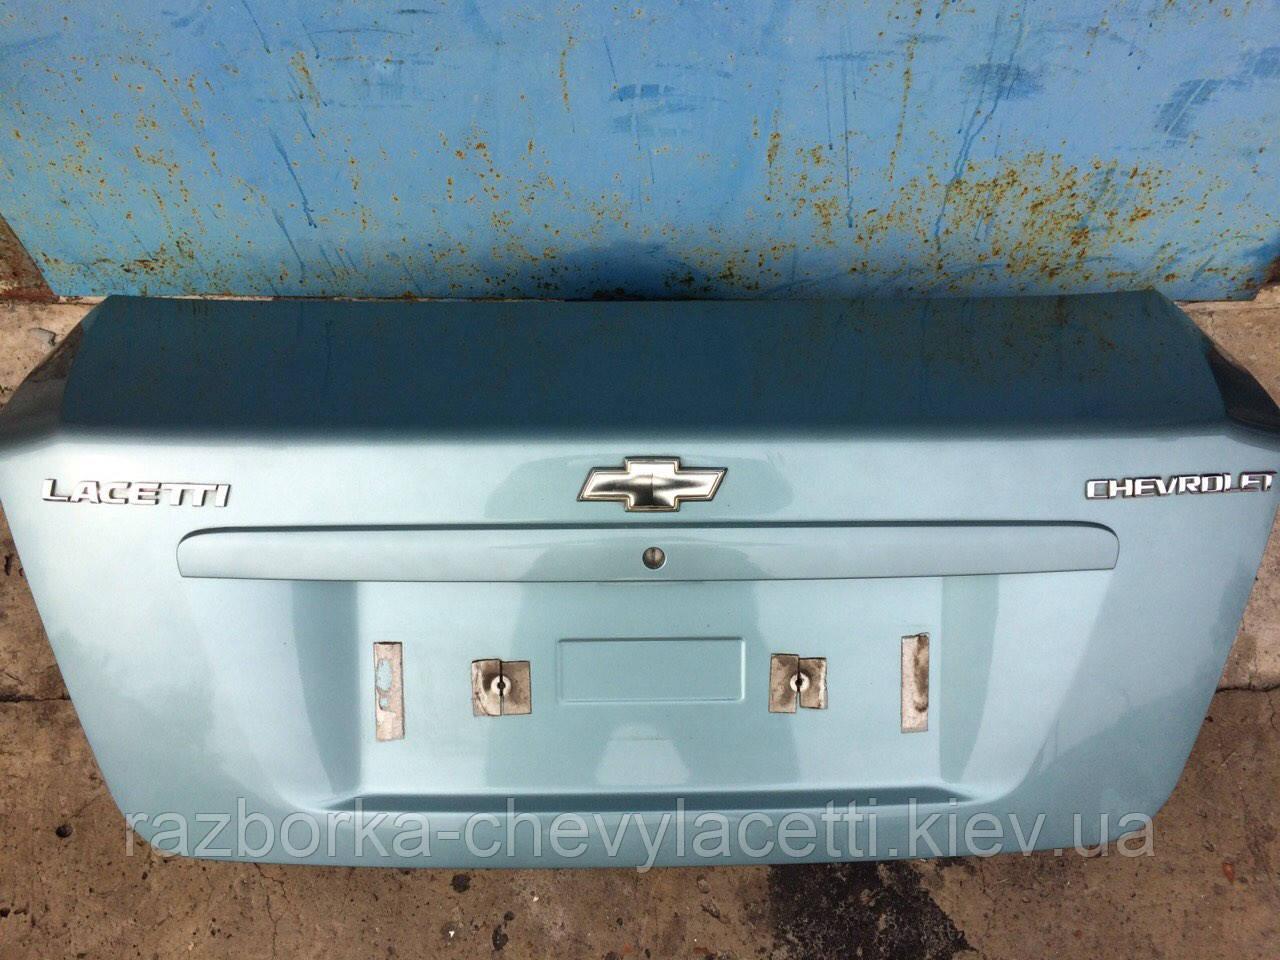 Крышка багажника Chevrolet Lacetti седан 96474985